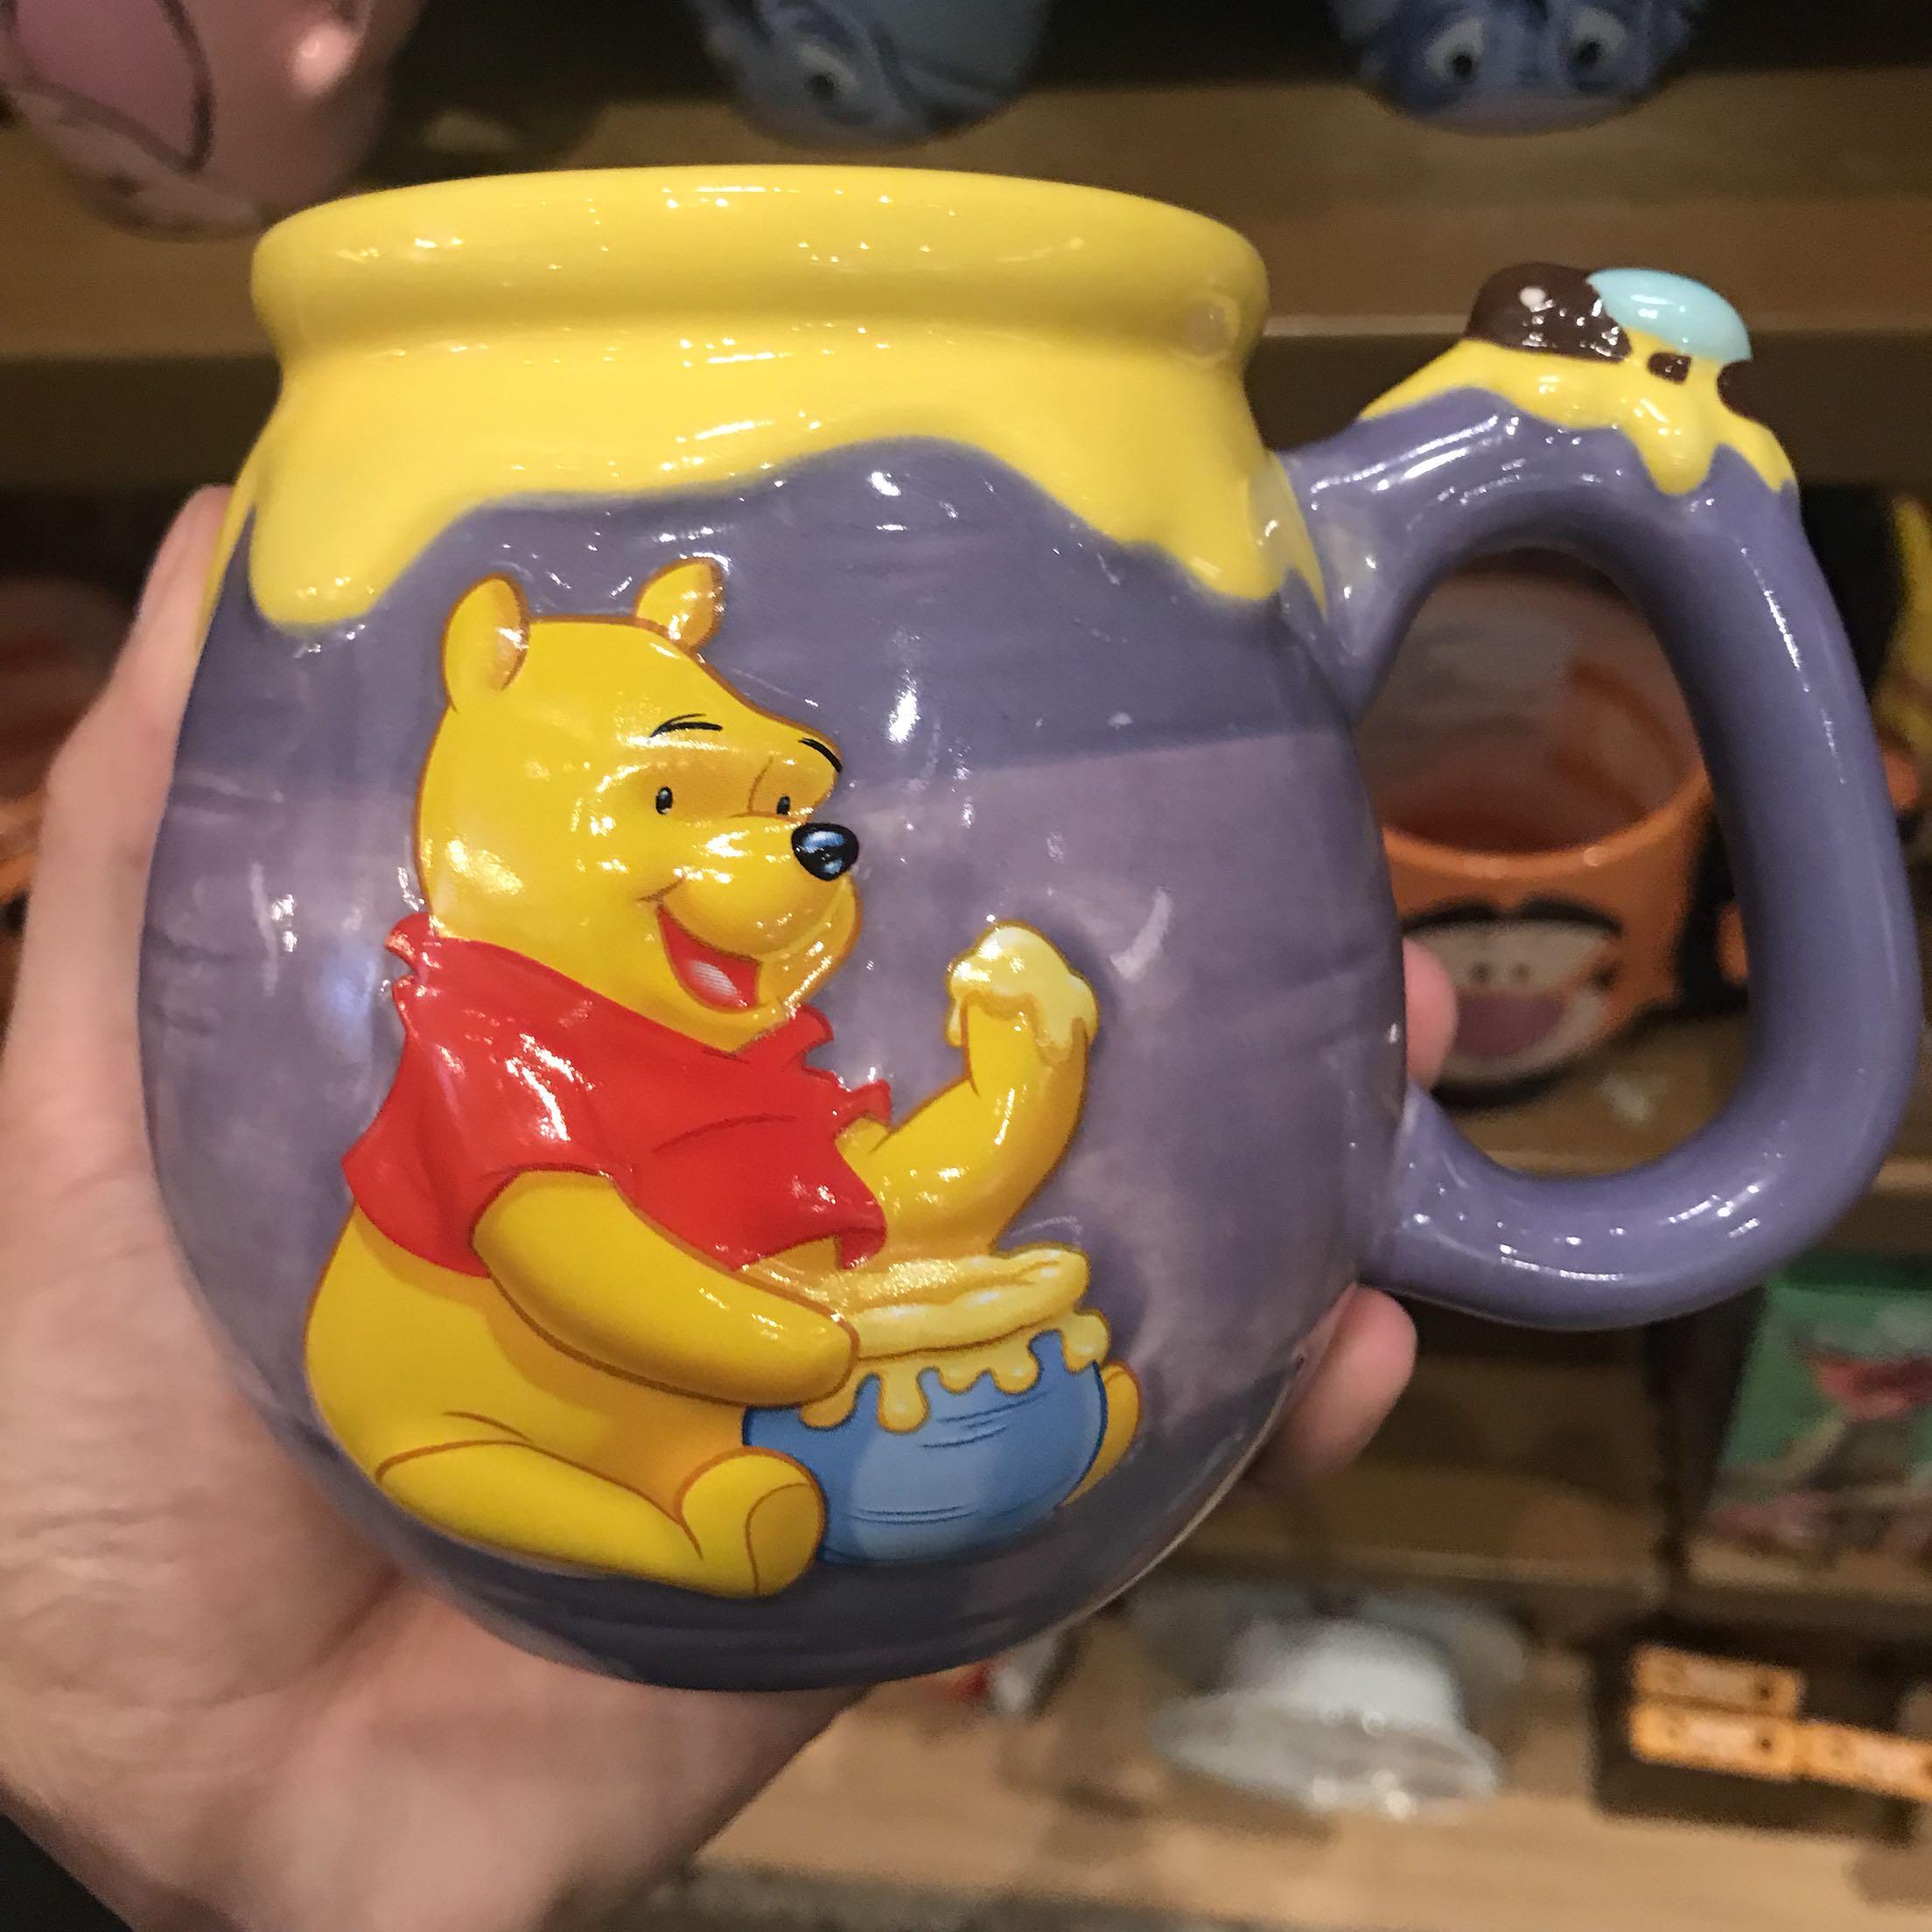 Disney 7PCS Ceramic Cup And 93 PCS Socks 3Bag 1 Glass ball 3doll Fashion Mugs